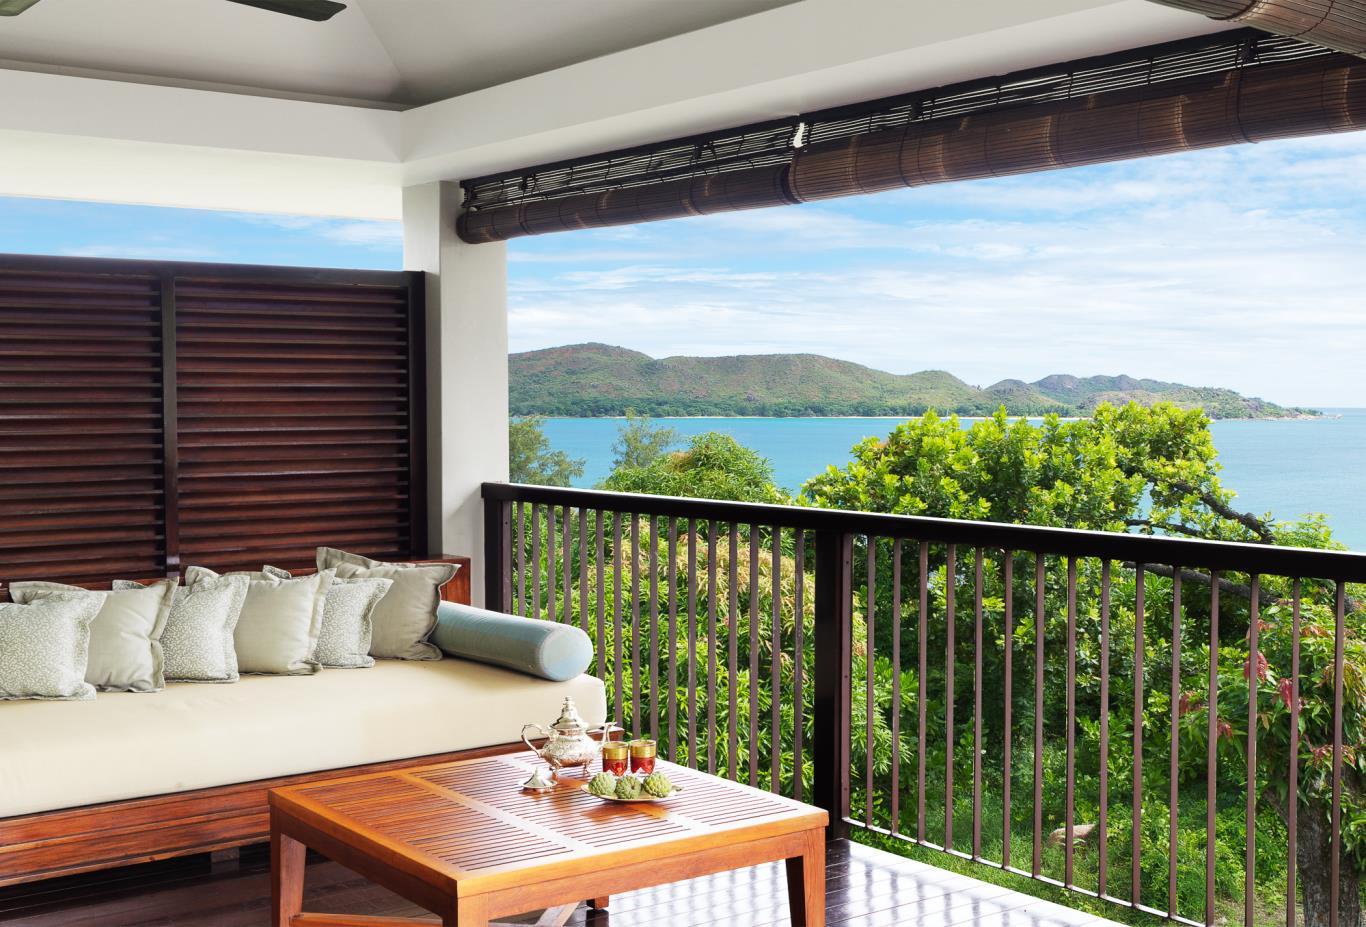 One Bed Ocean View Villa balcony